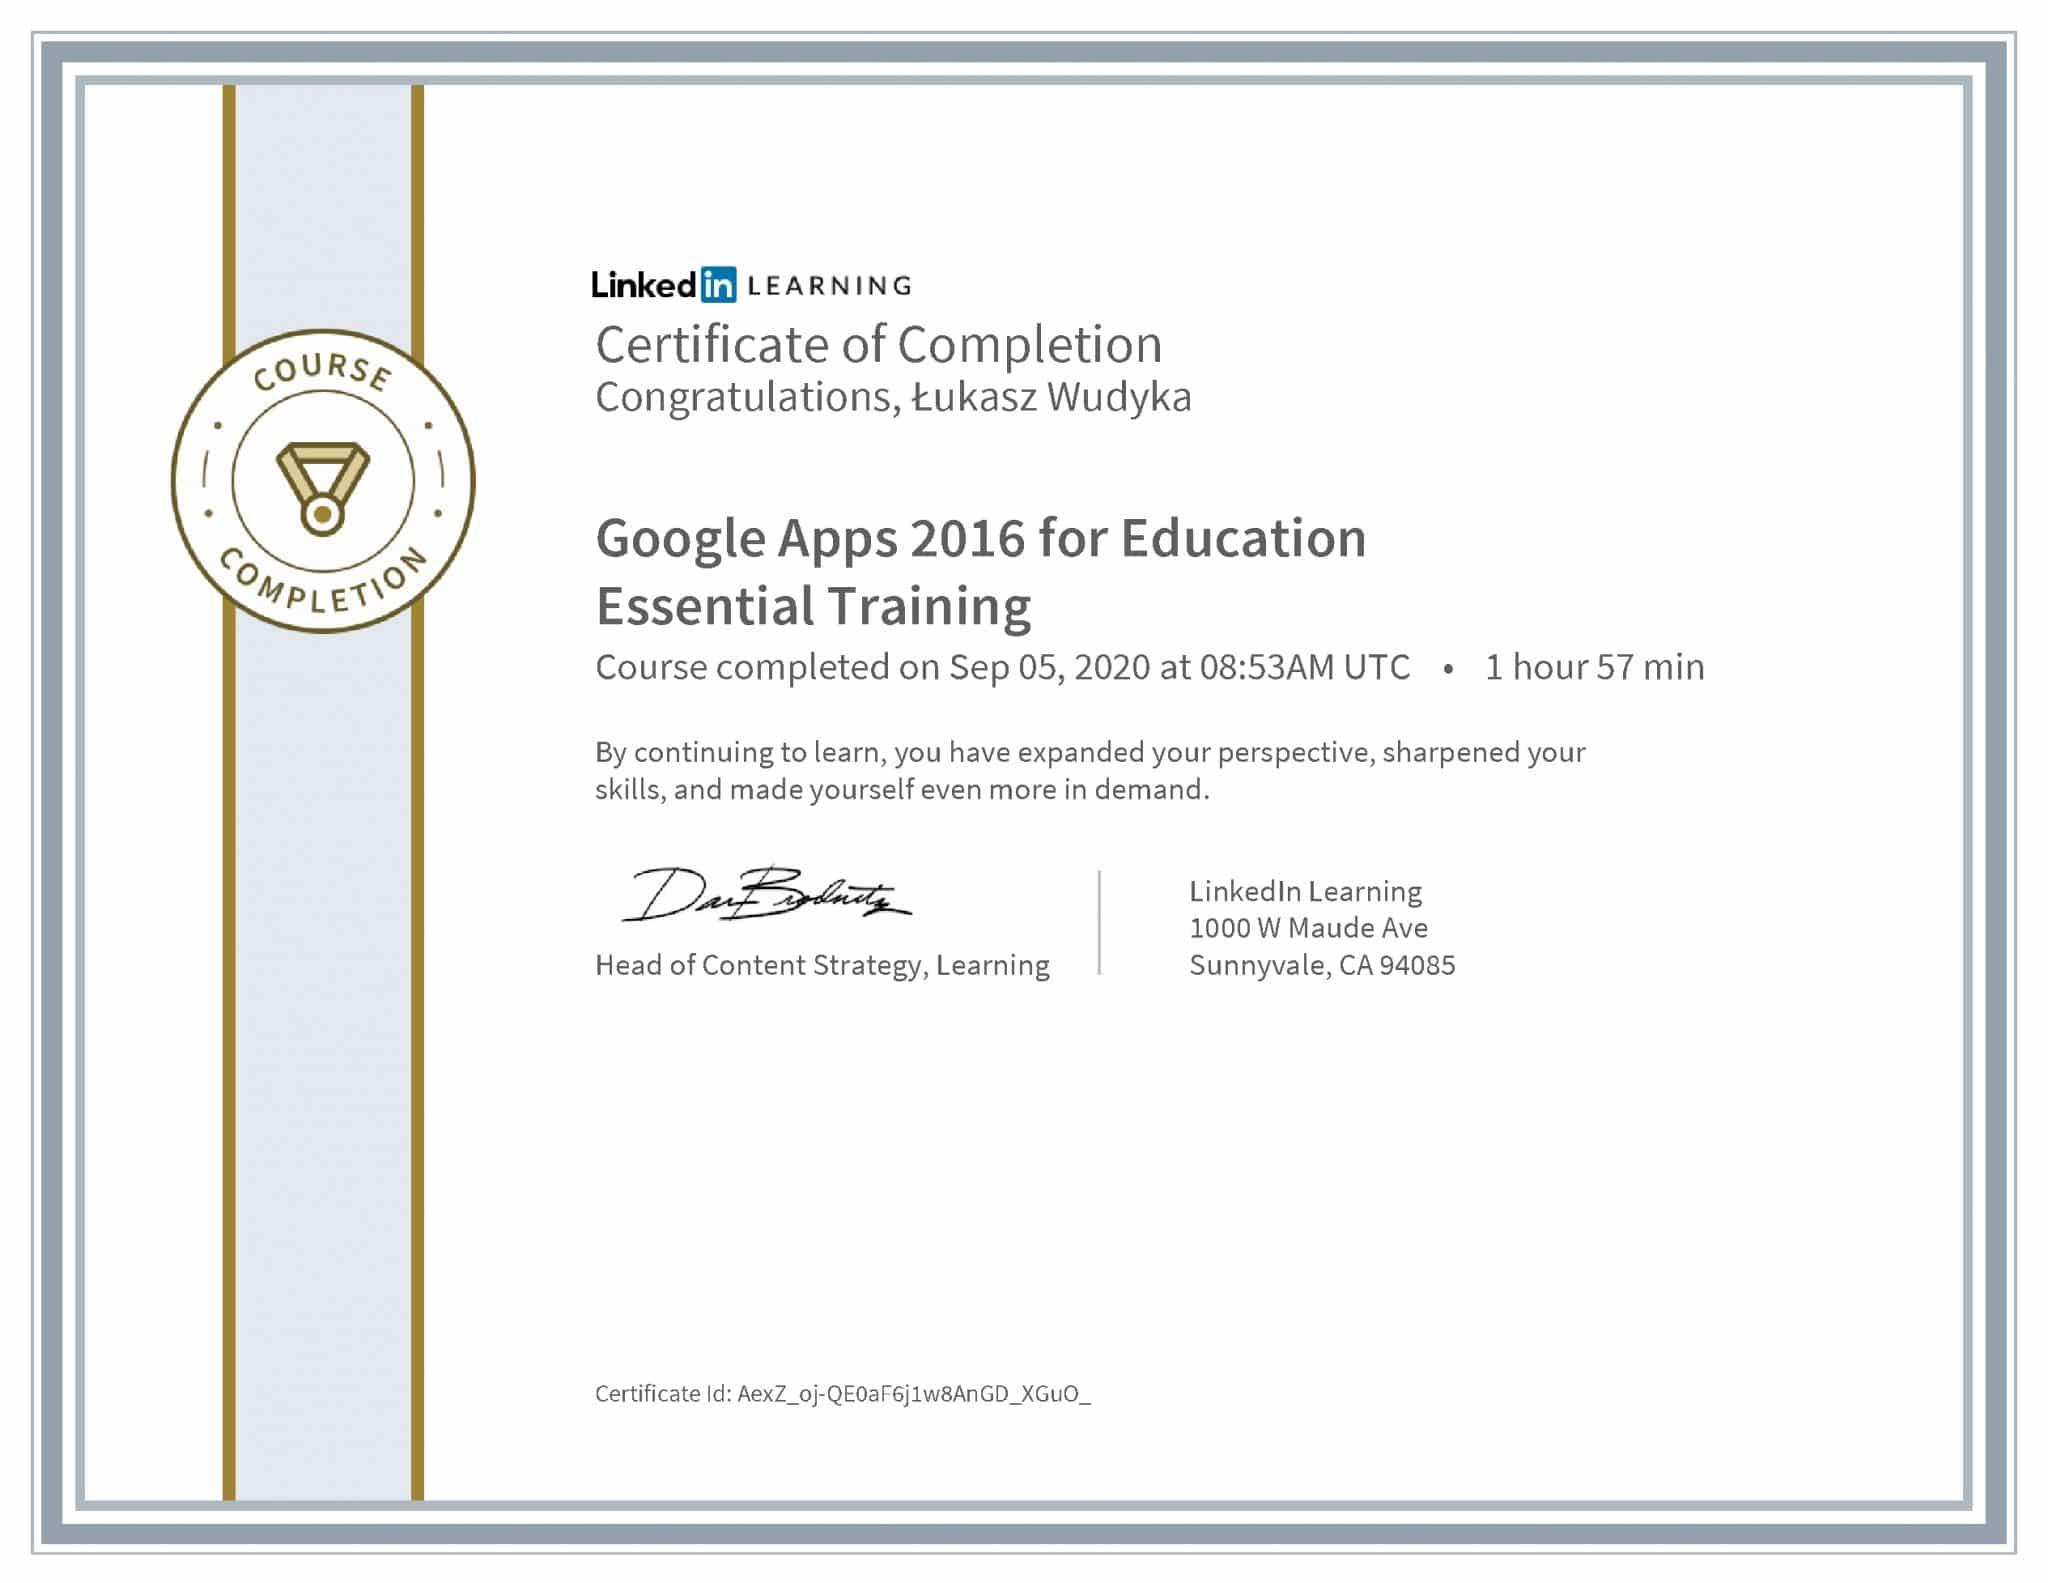 Łukasz Wudyka certyfikat LinkedIn Google Apps 2016 for Education Essential Training